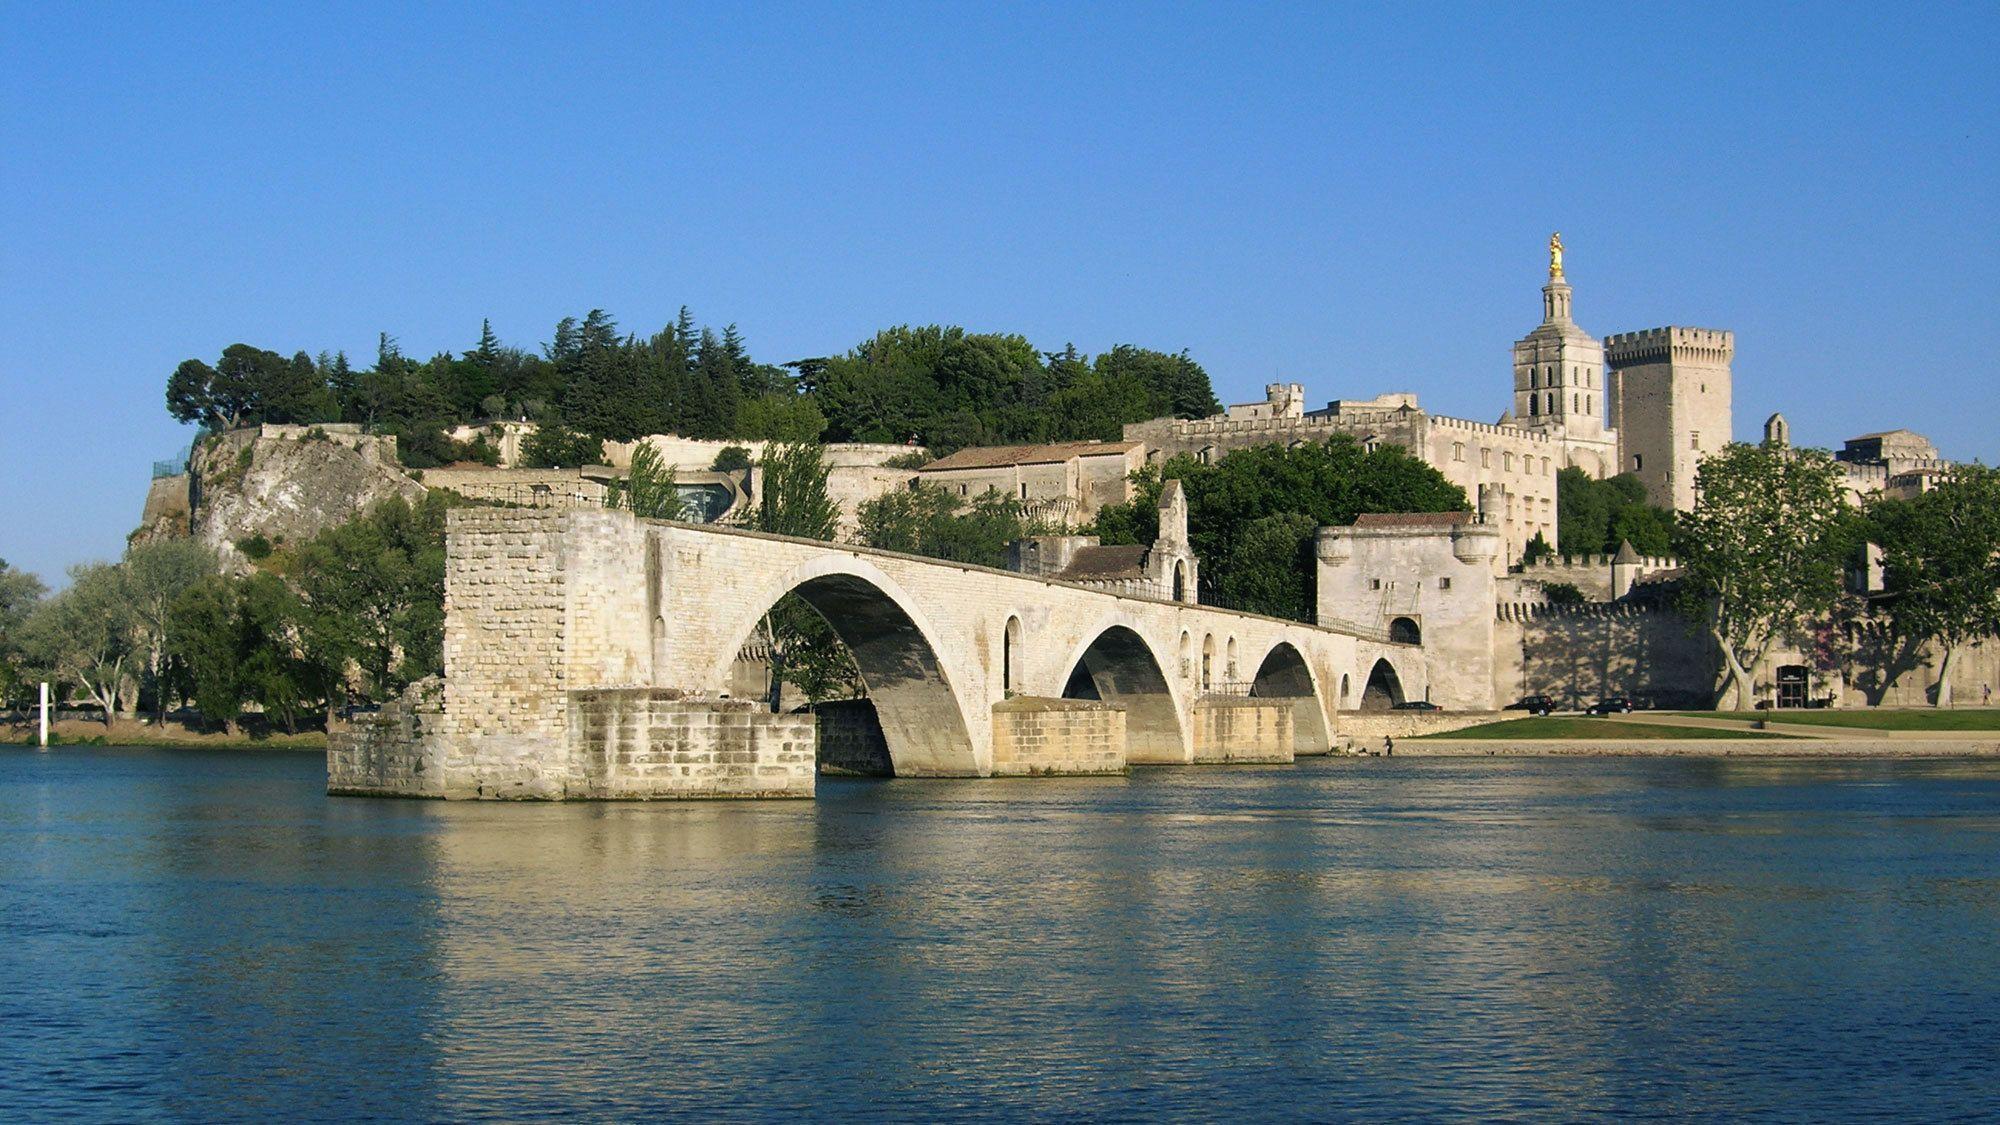 stone bridge and river near Avignon Papal palace in Marseilee